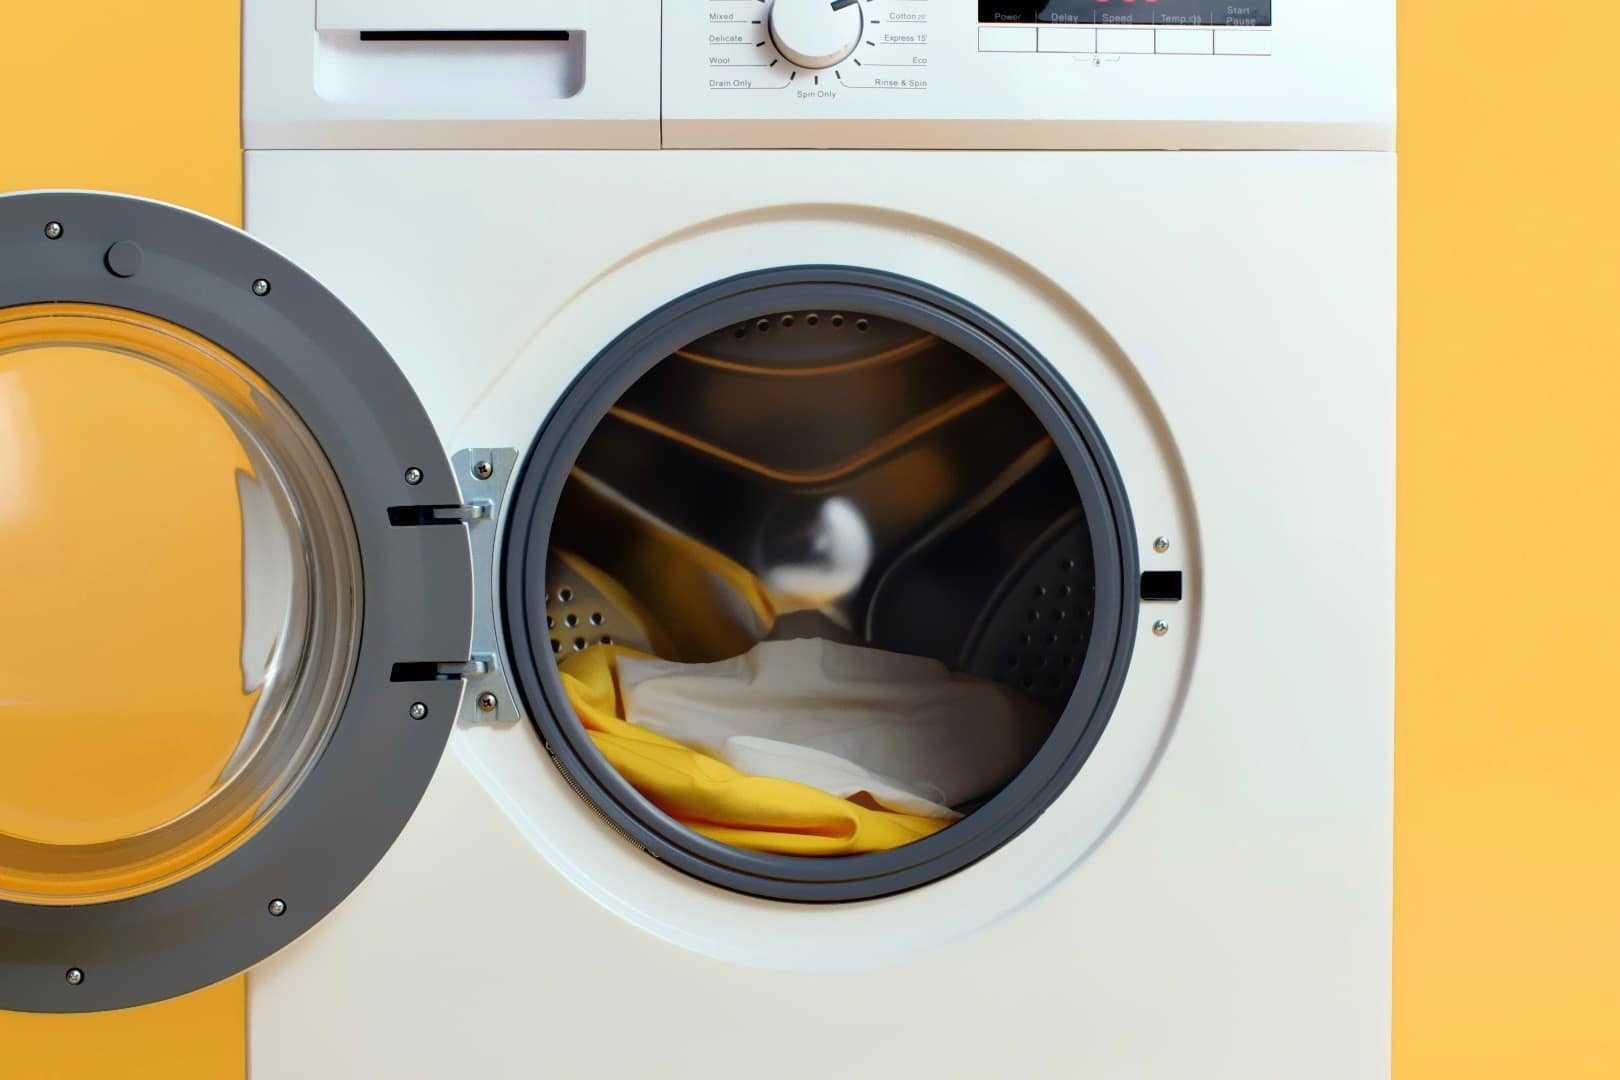 Giặt áo da bằng máy giặt